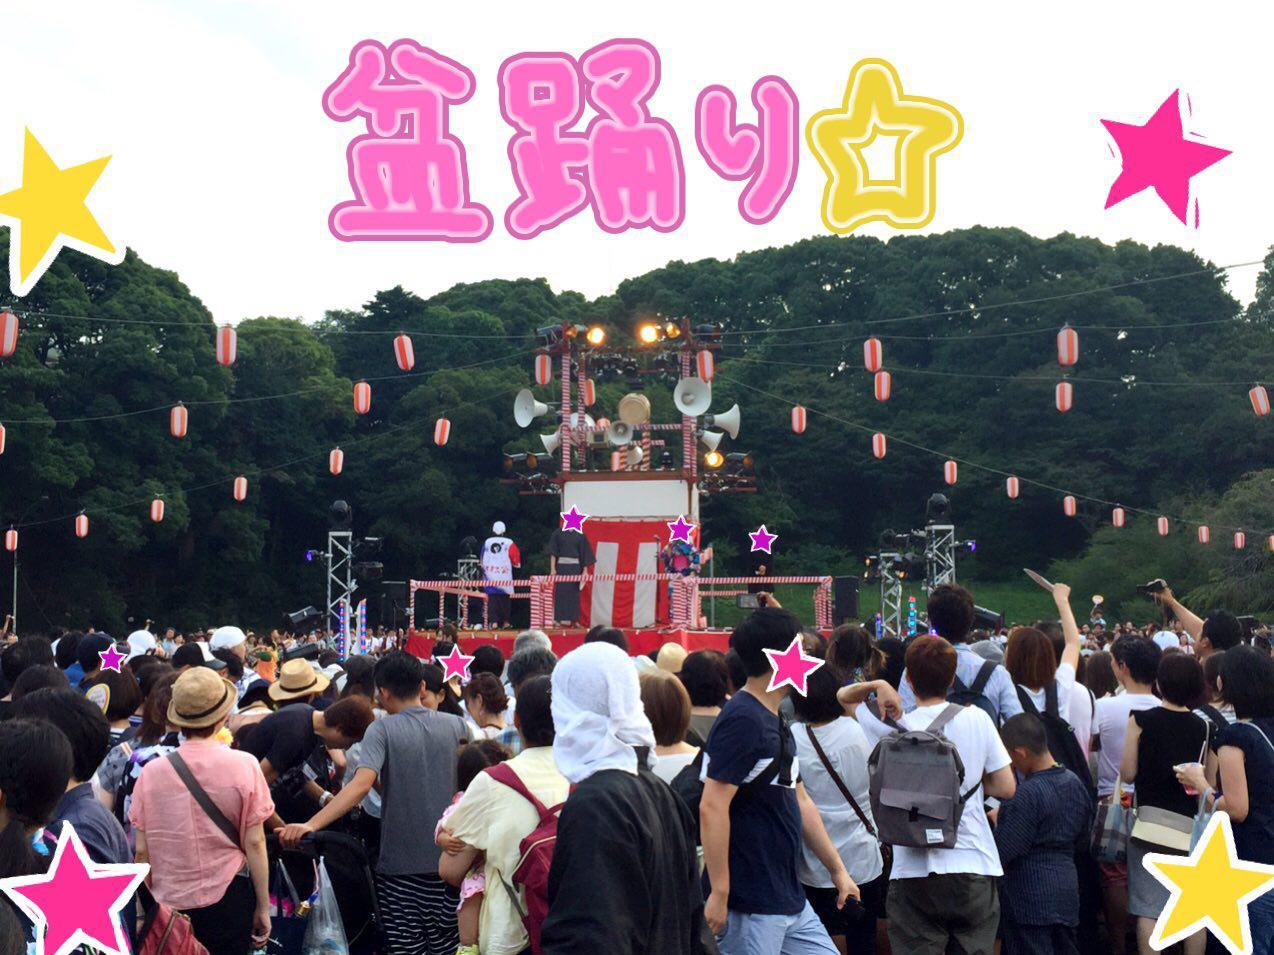 photo_2017-07-17_23-45-00.jpg